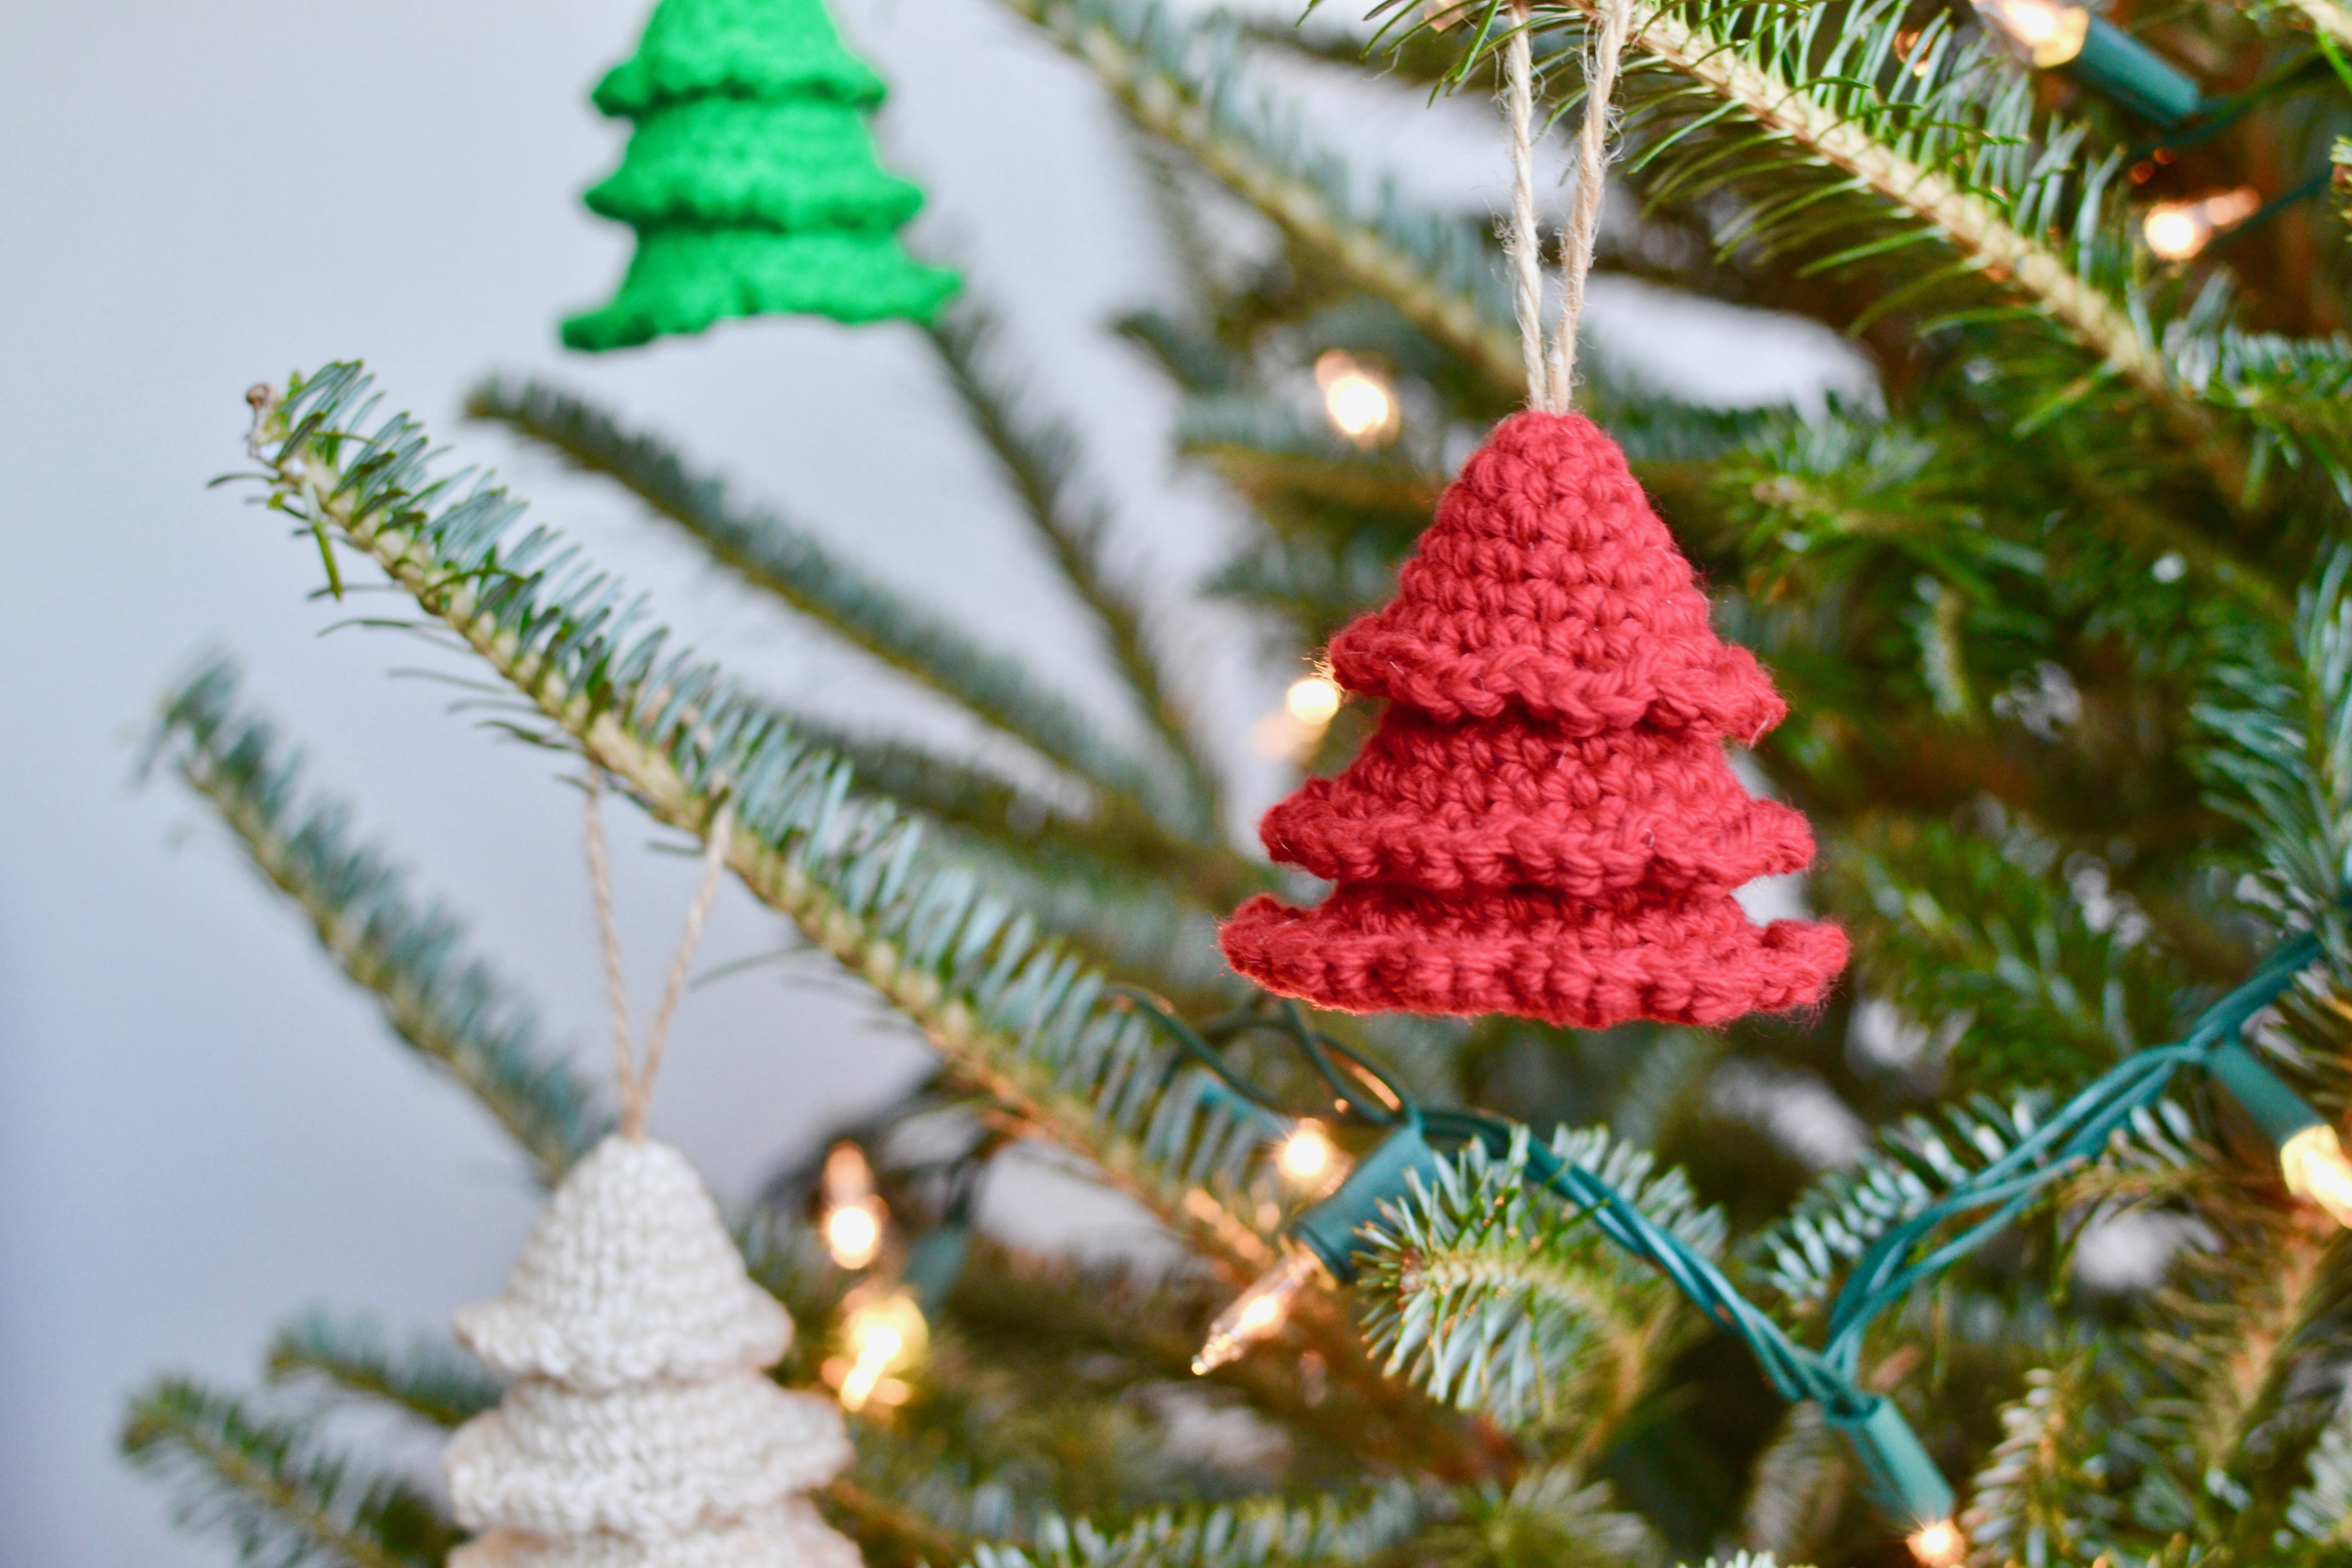 Rustic Tree Ornaments Crochet Pattern By Yarn Society